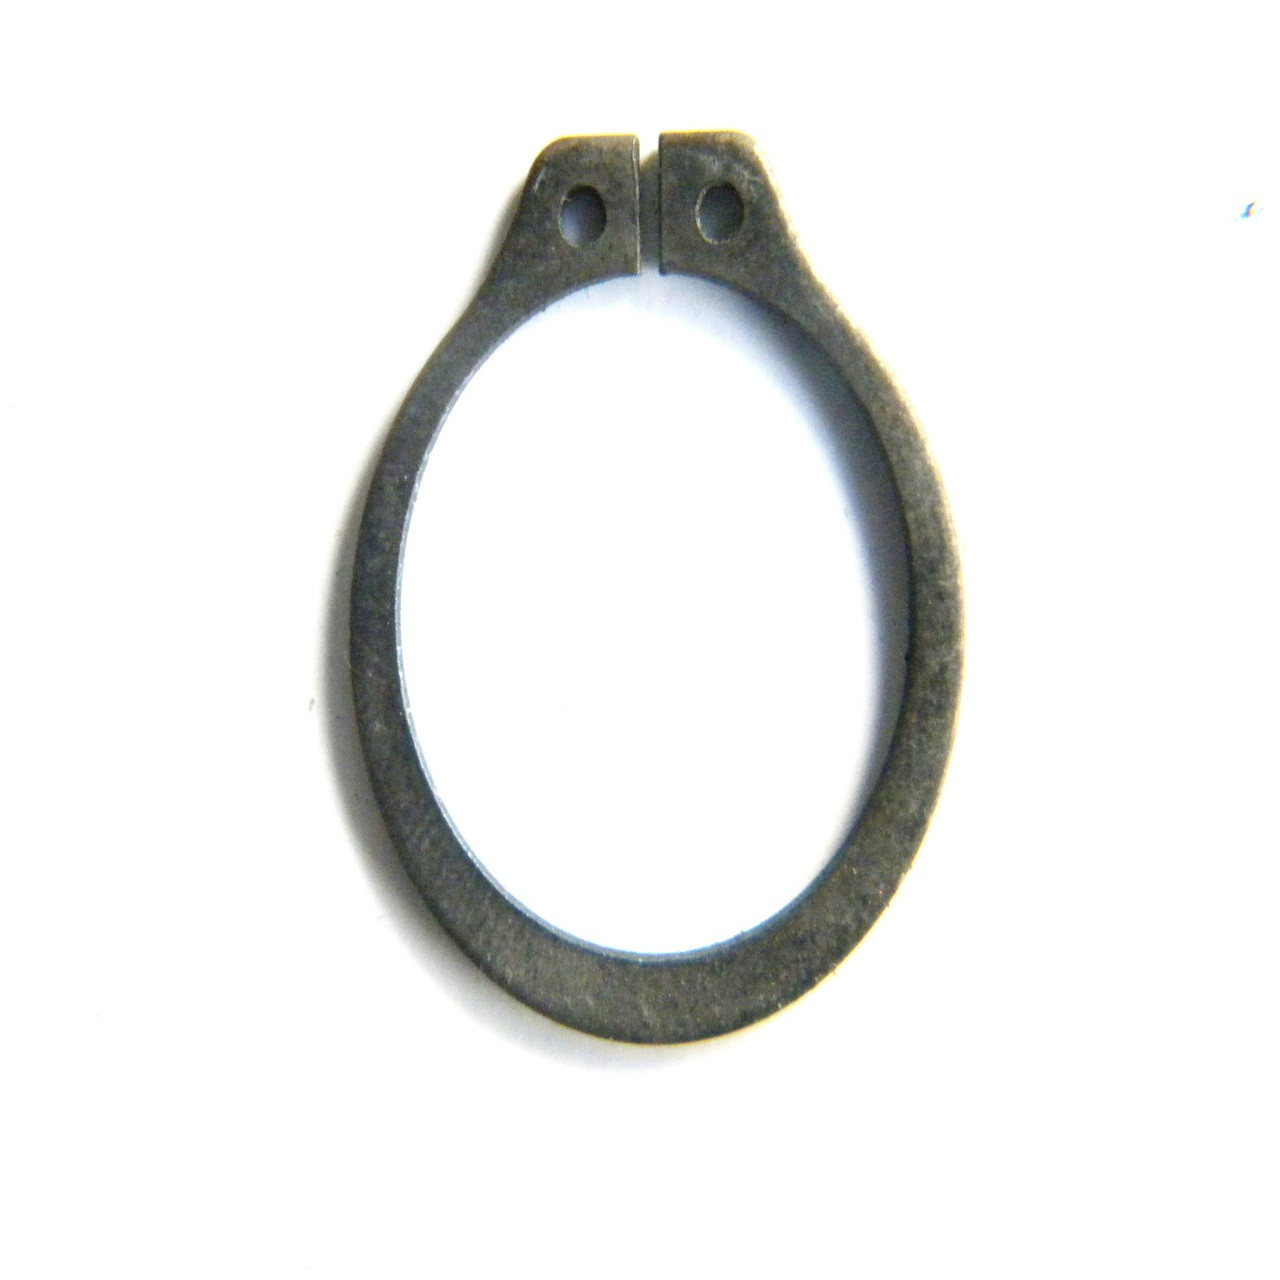 Elliptical Crank Snap Ring Part Number 143742